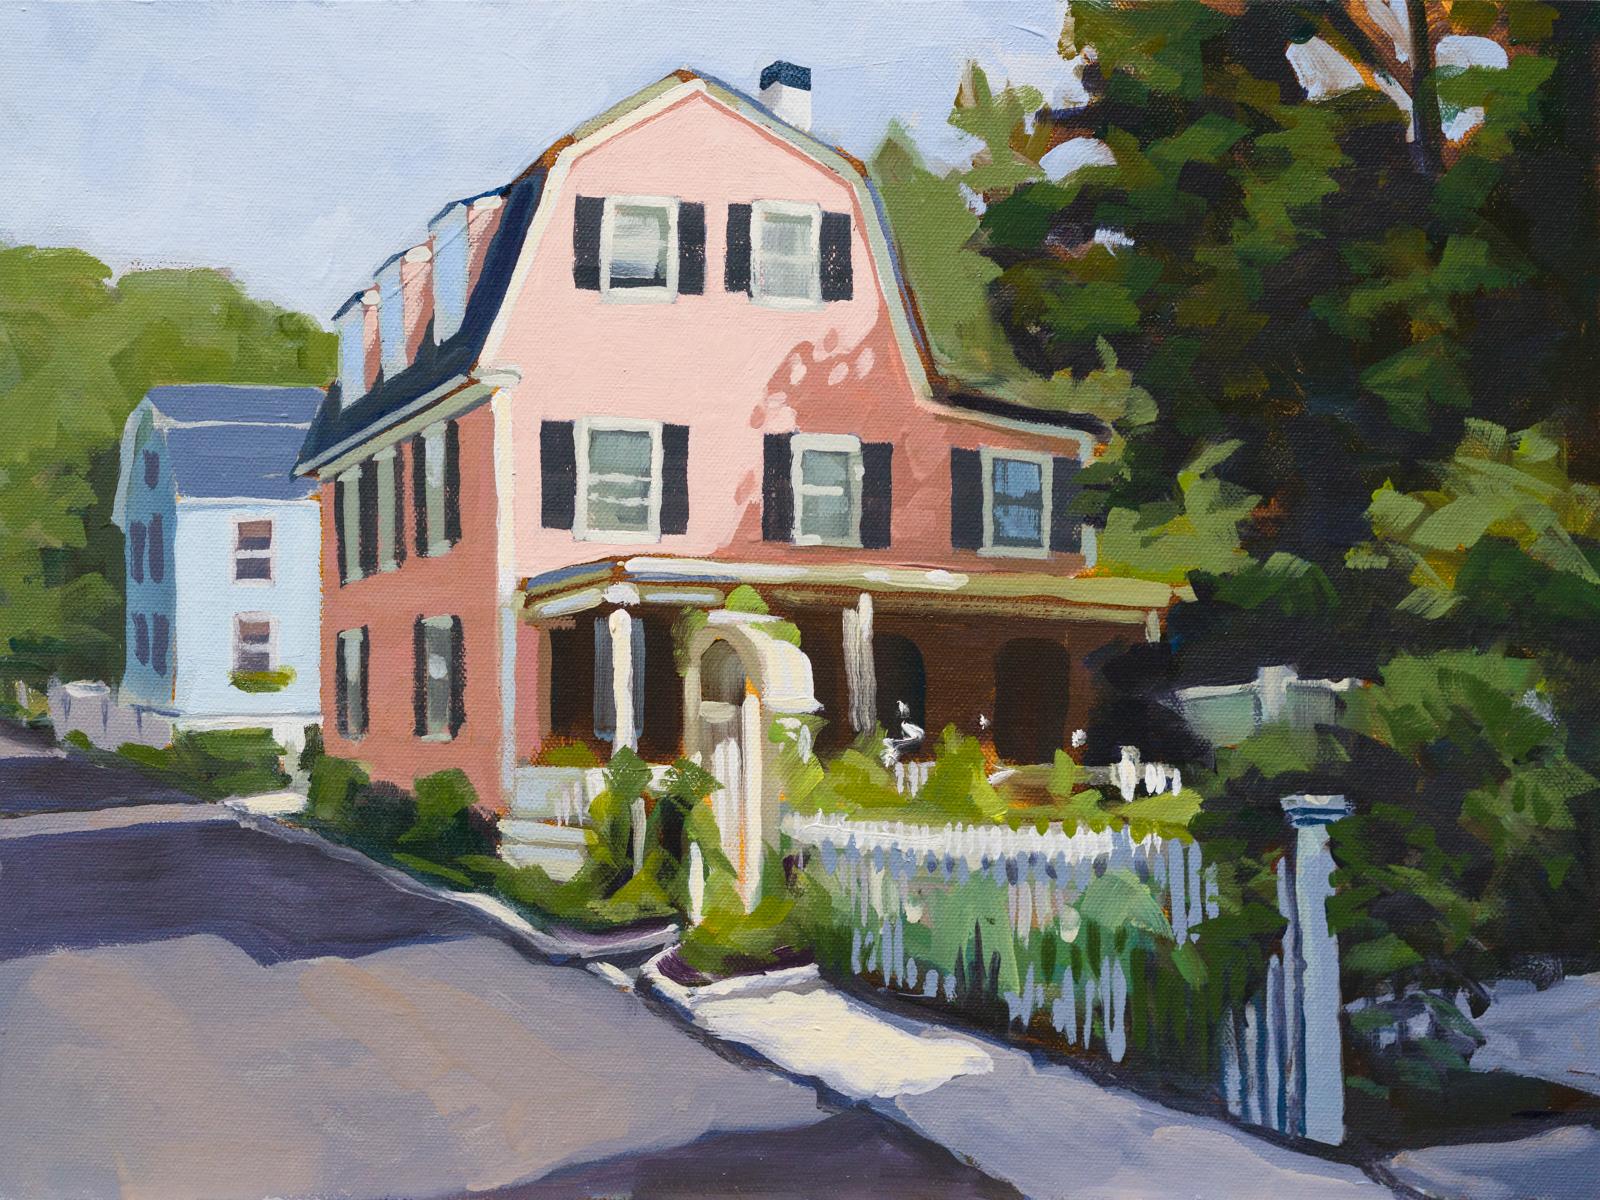 The Pink House, Salem